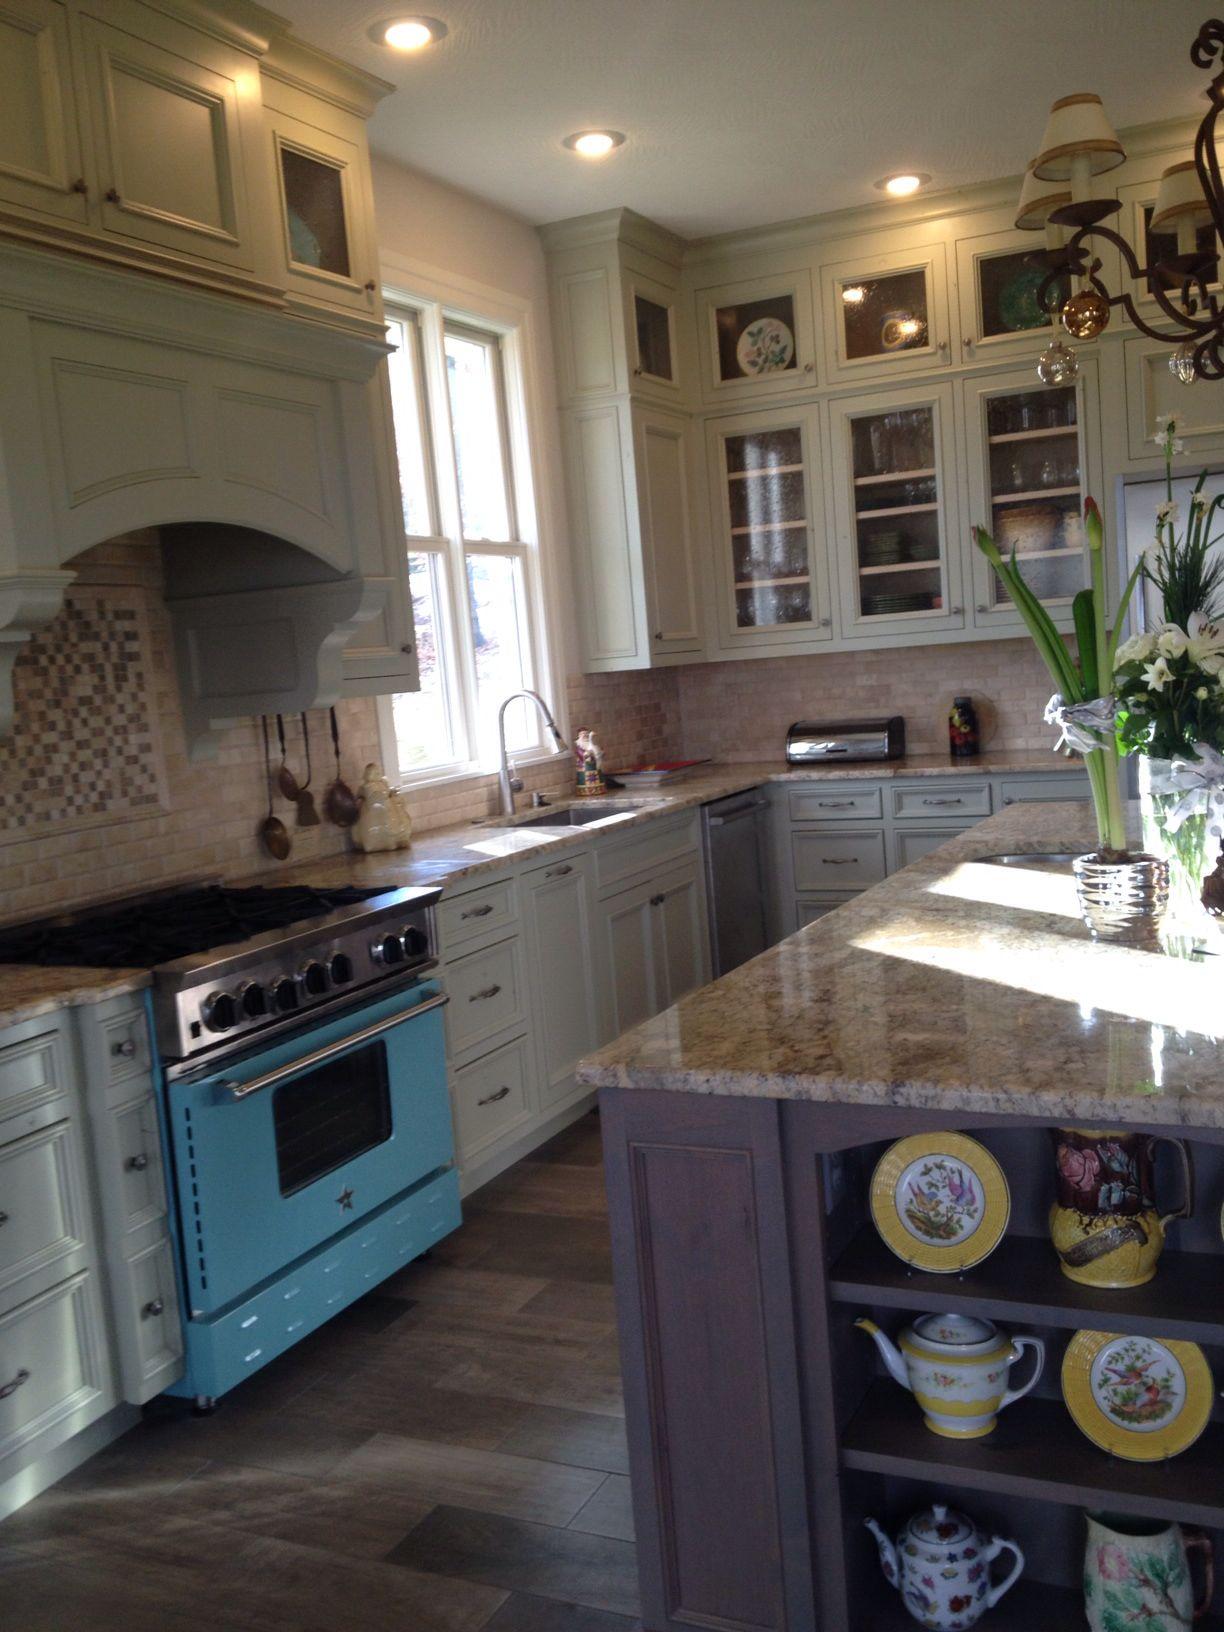 Blue Star Oven Svelte Sage Cabinets Sage Kitchen Kitchen Renovation Green Backsplash